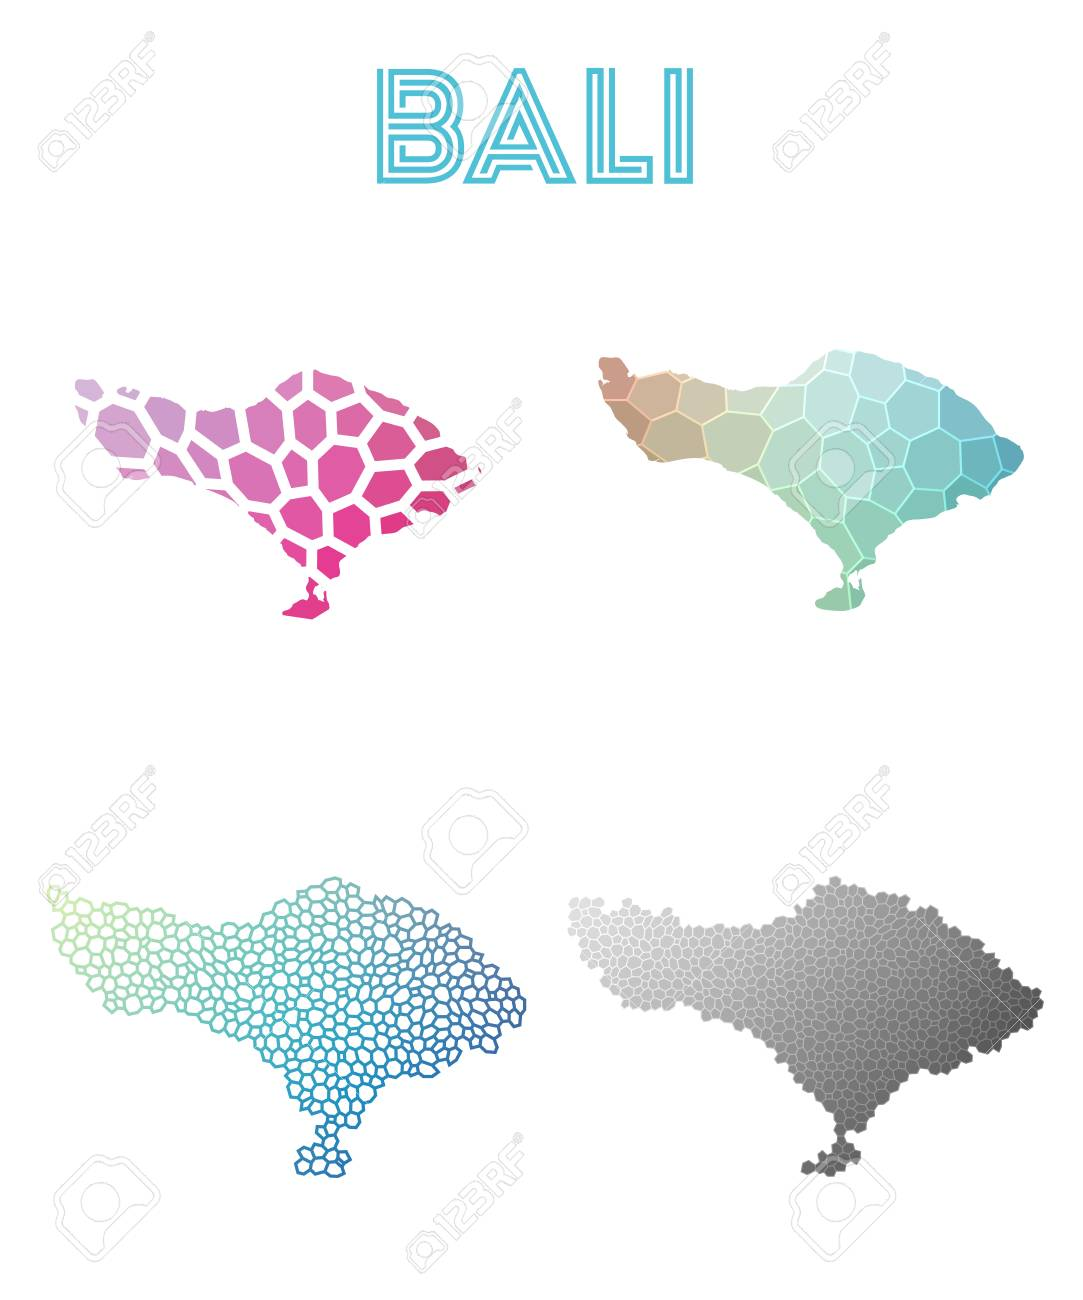 Bali Polygonal Island Map Mosaic Style Maps Collection Bright